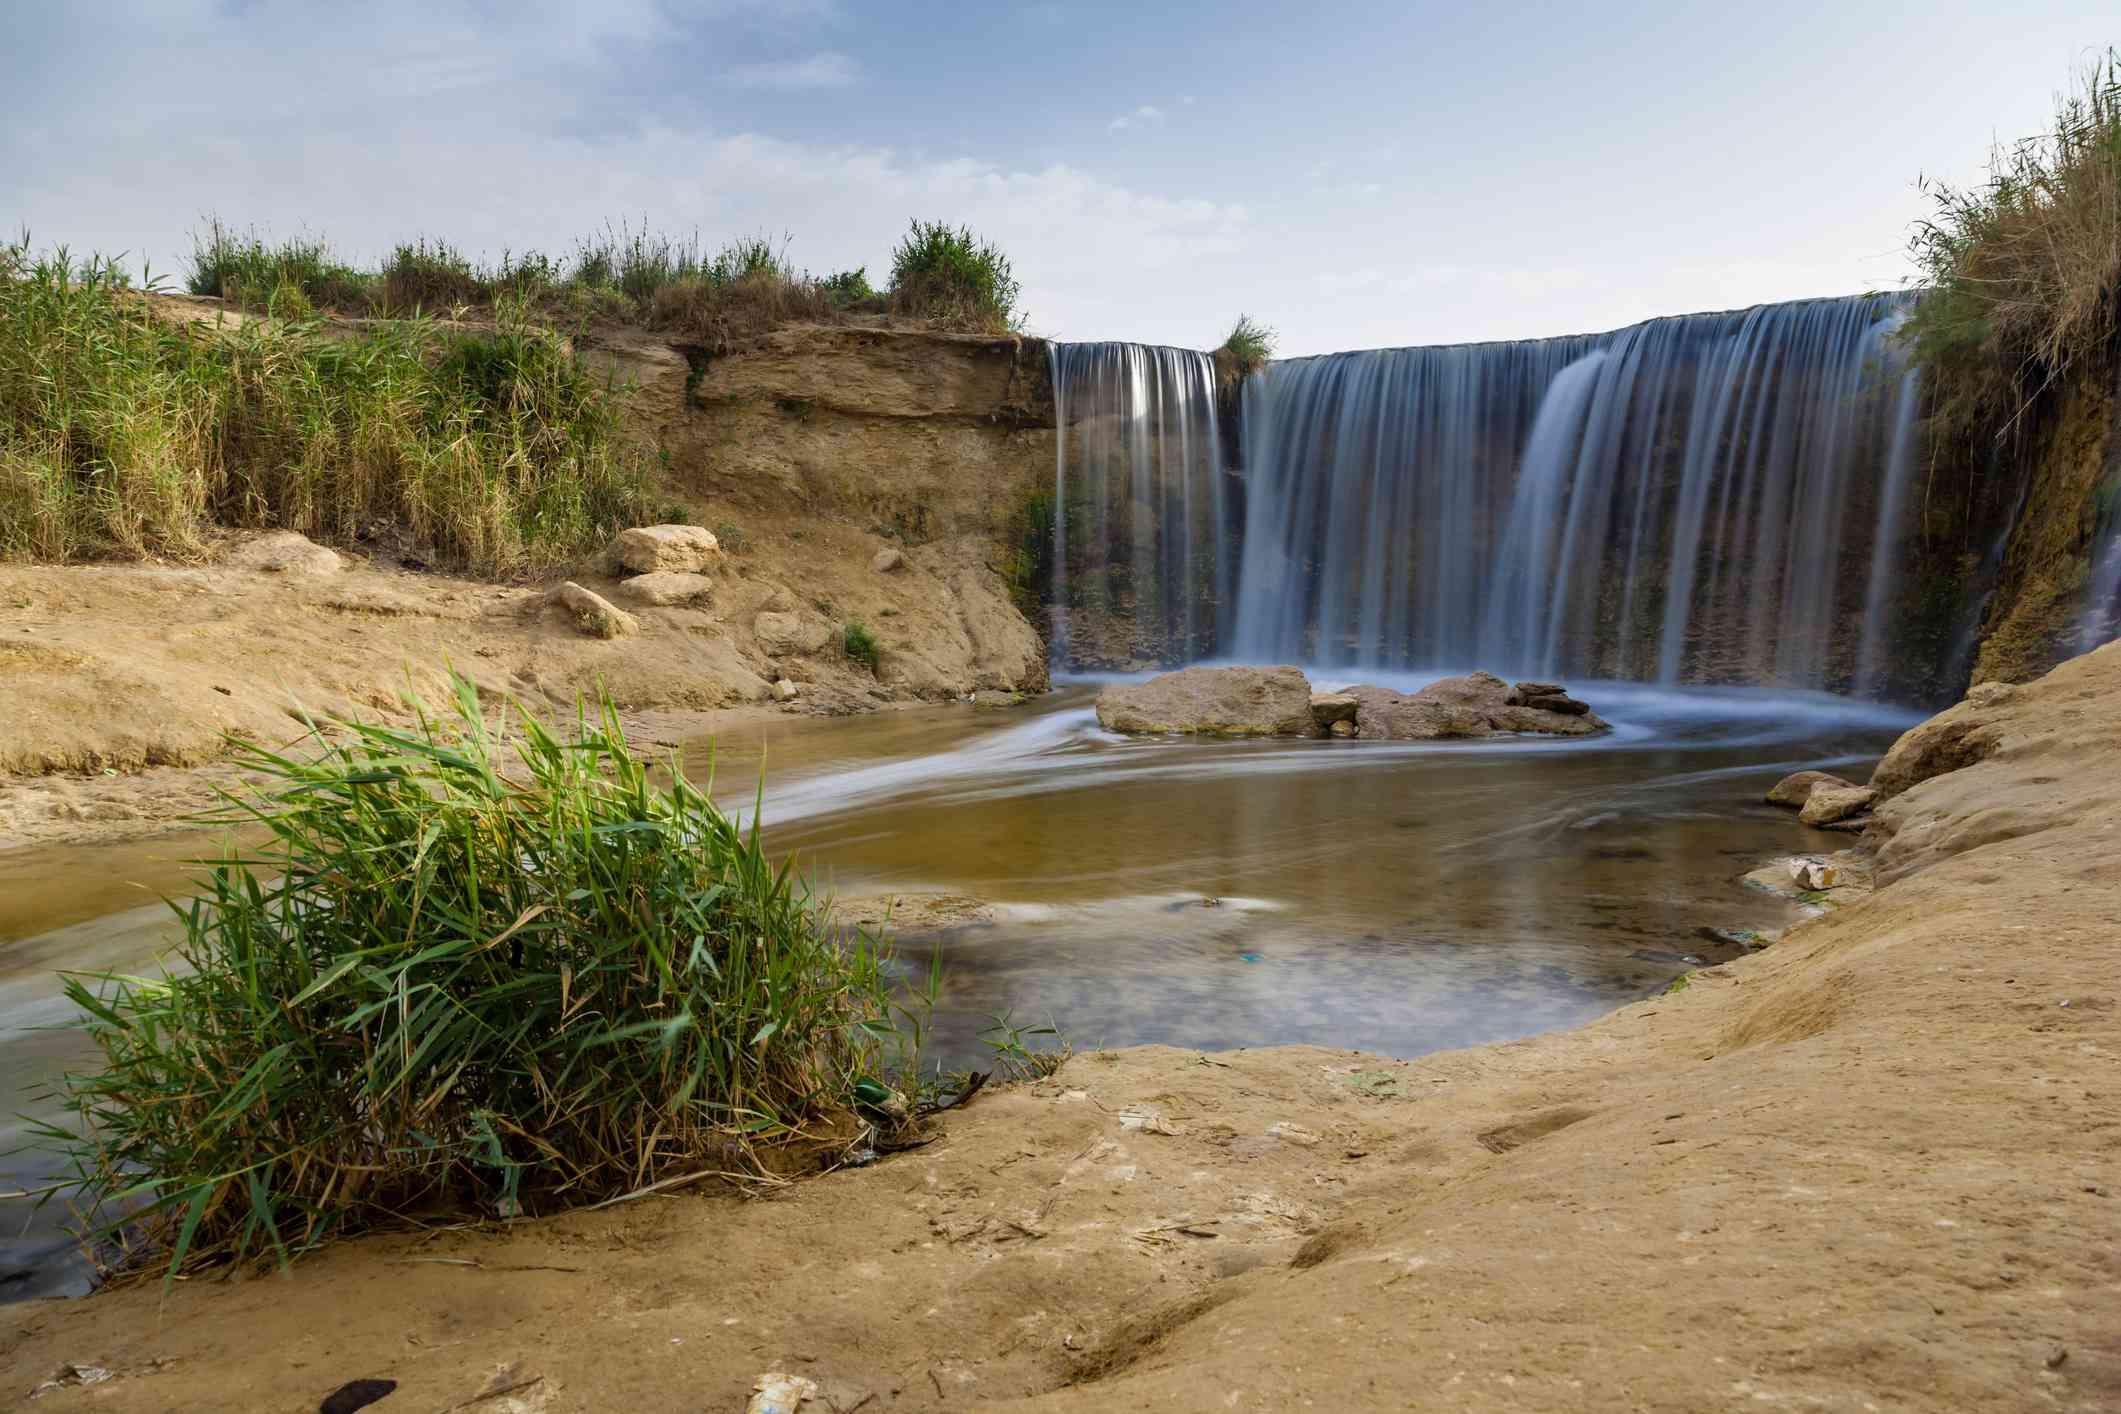 Wadi el Rayan Waterfalls, Egypt